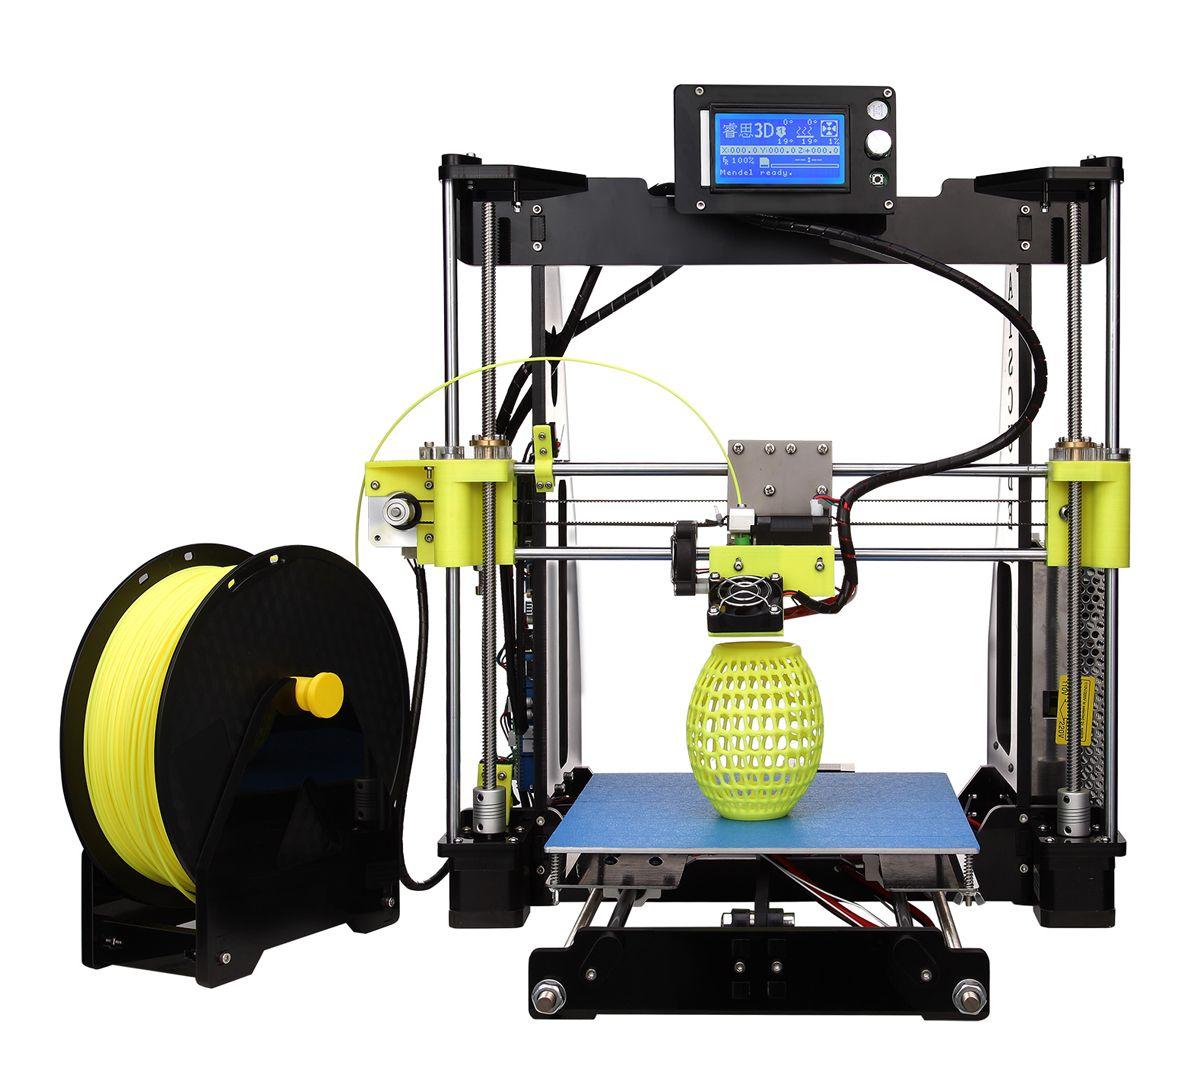 RAISCUBE R2 Prusa I3 DIY Impresora 3D 210 x 210 x 225 mm